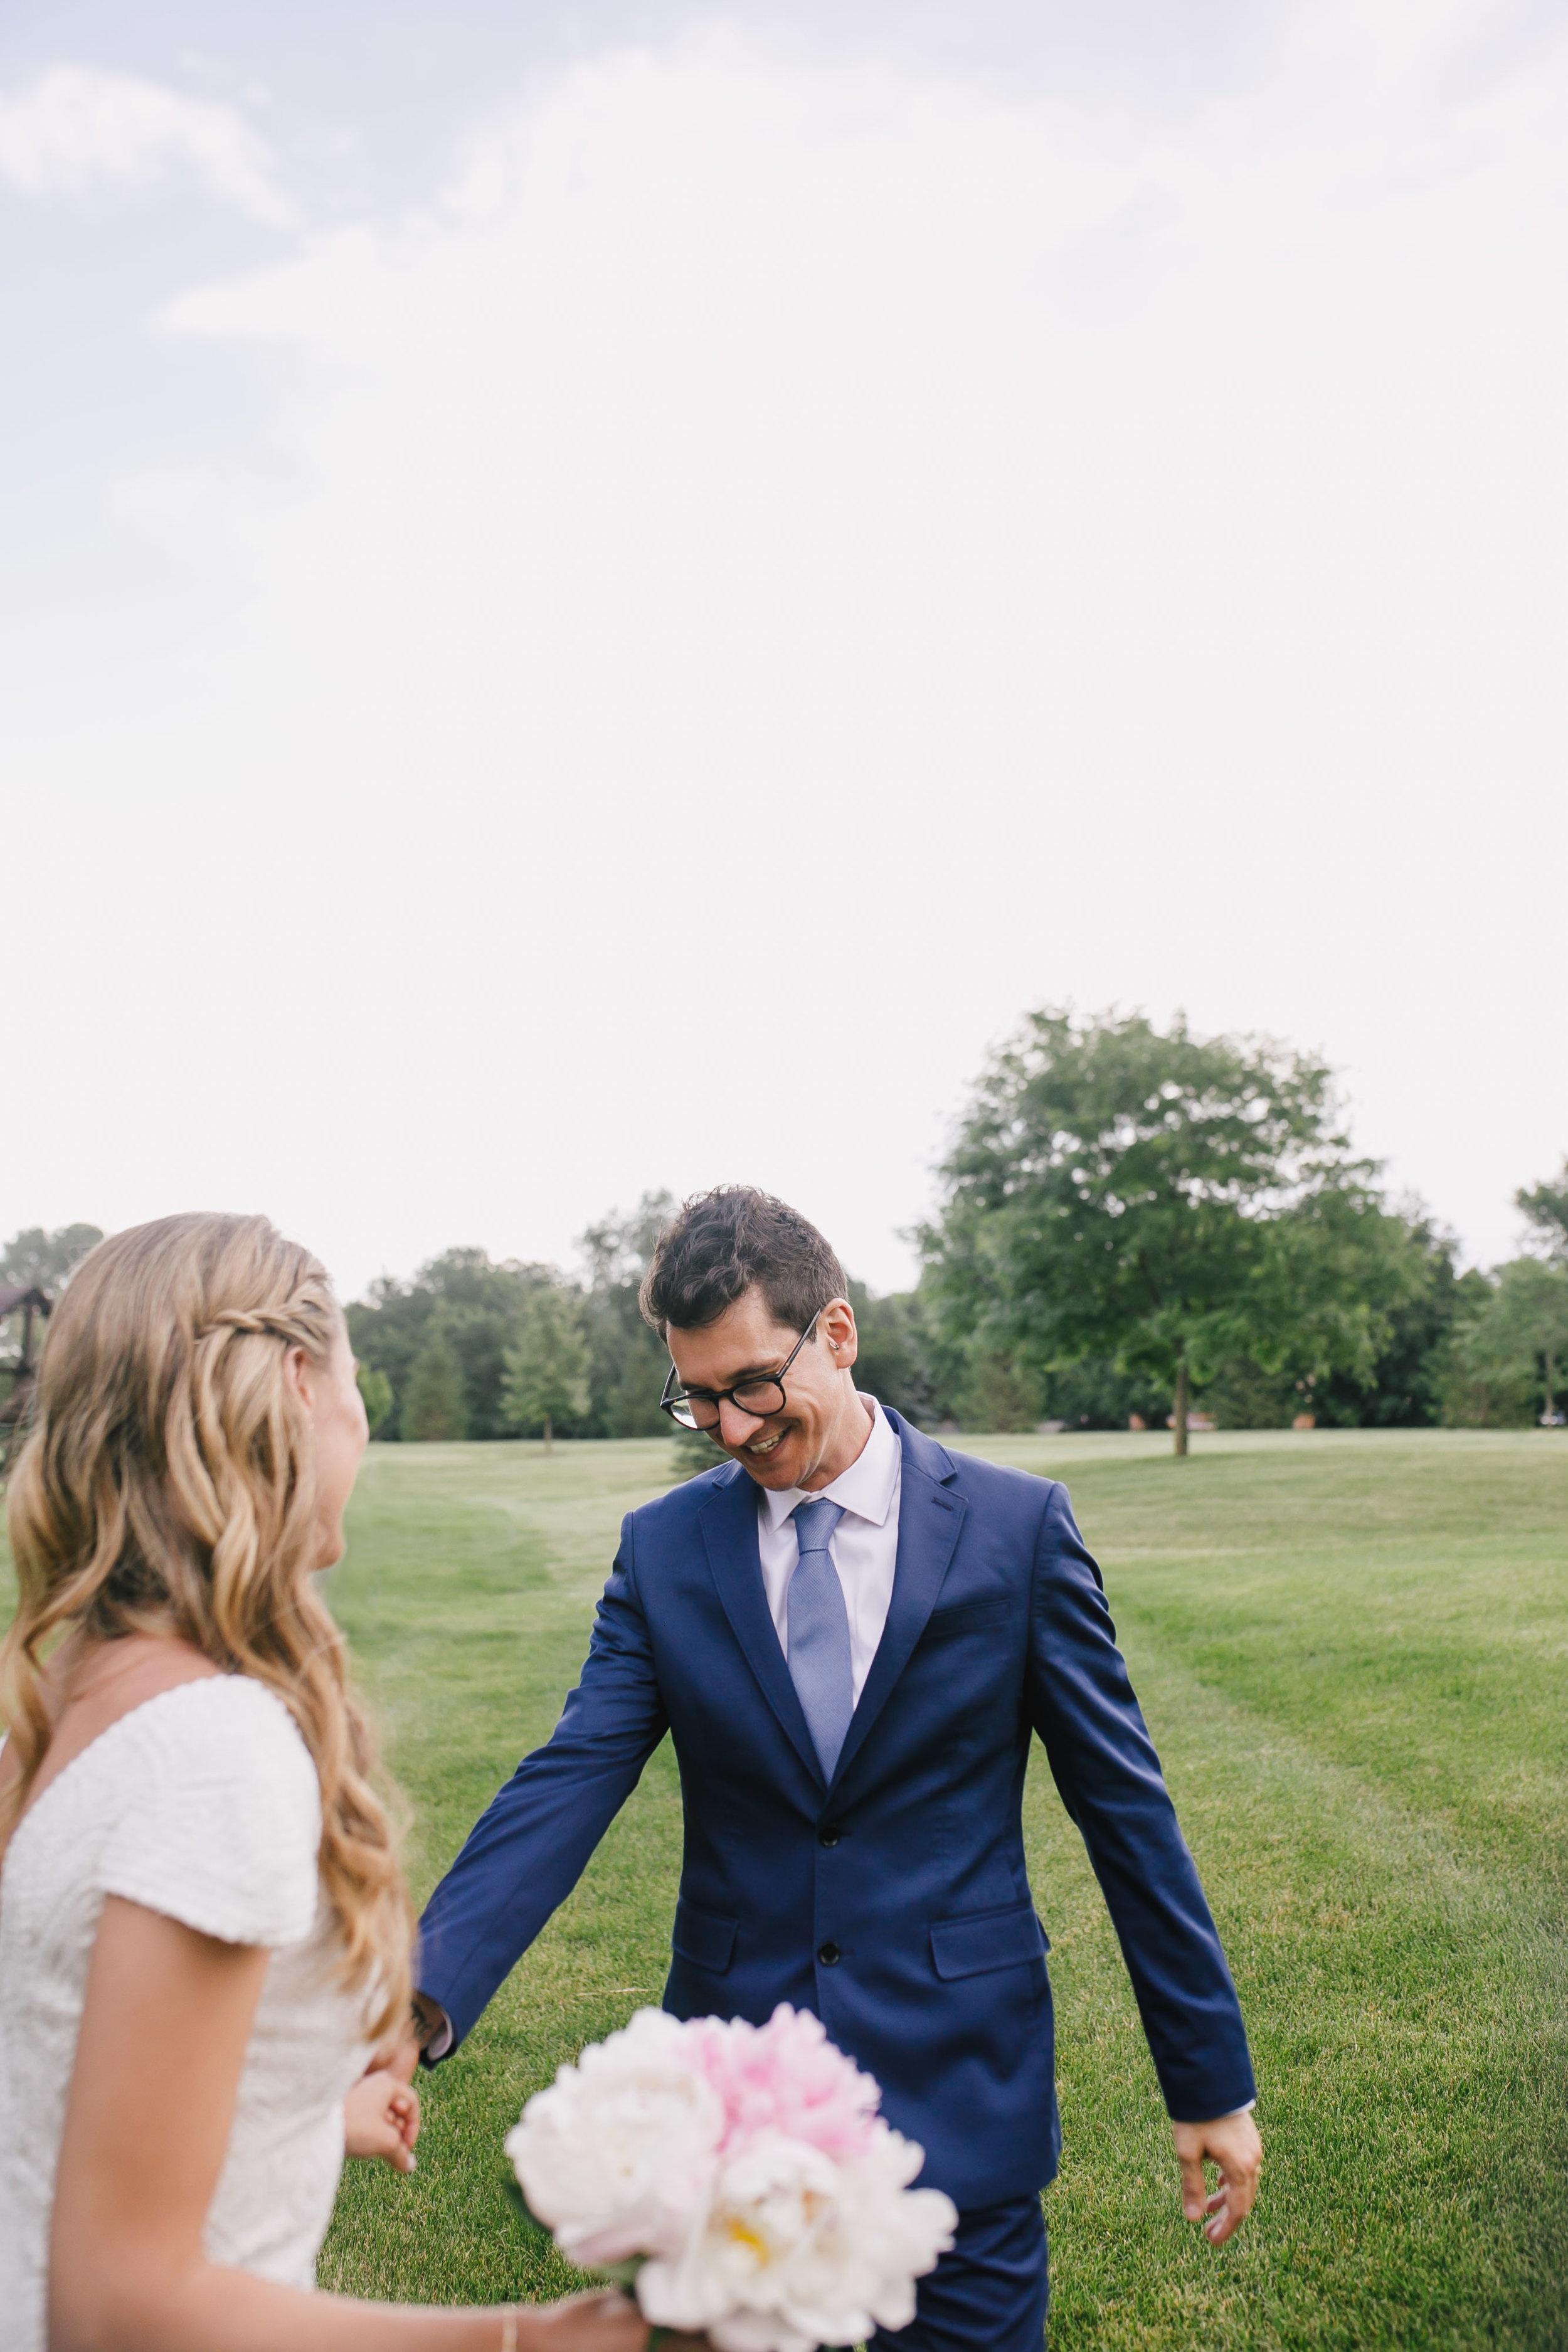 Chicago+Wedding+Photographer+%28Nixon+04%29-12.jpg